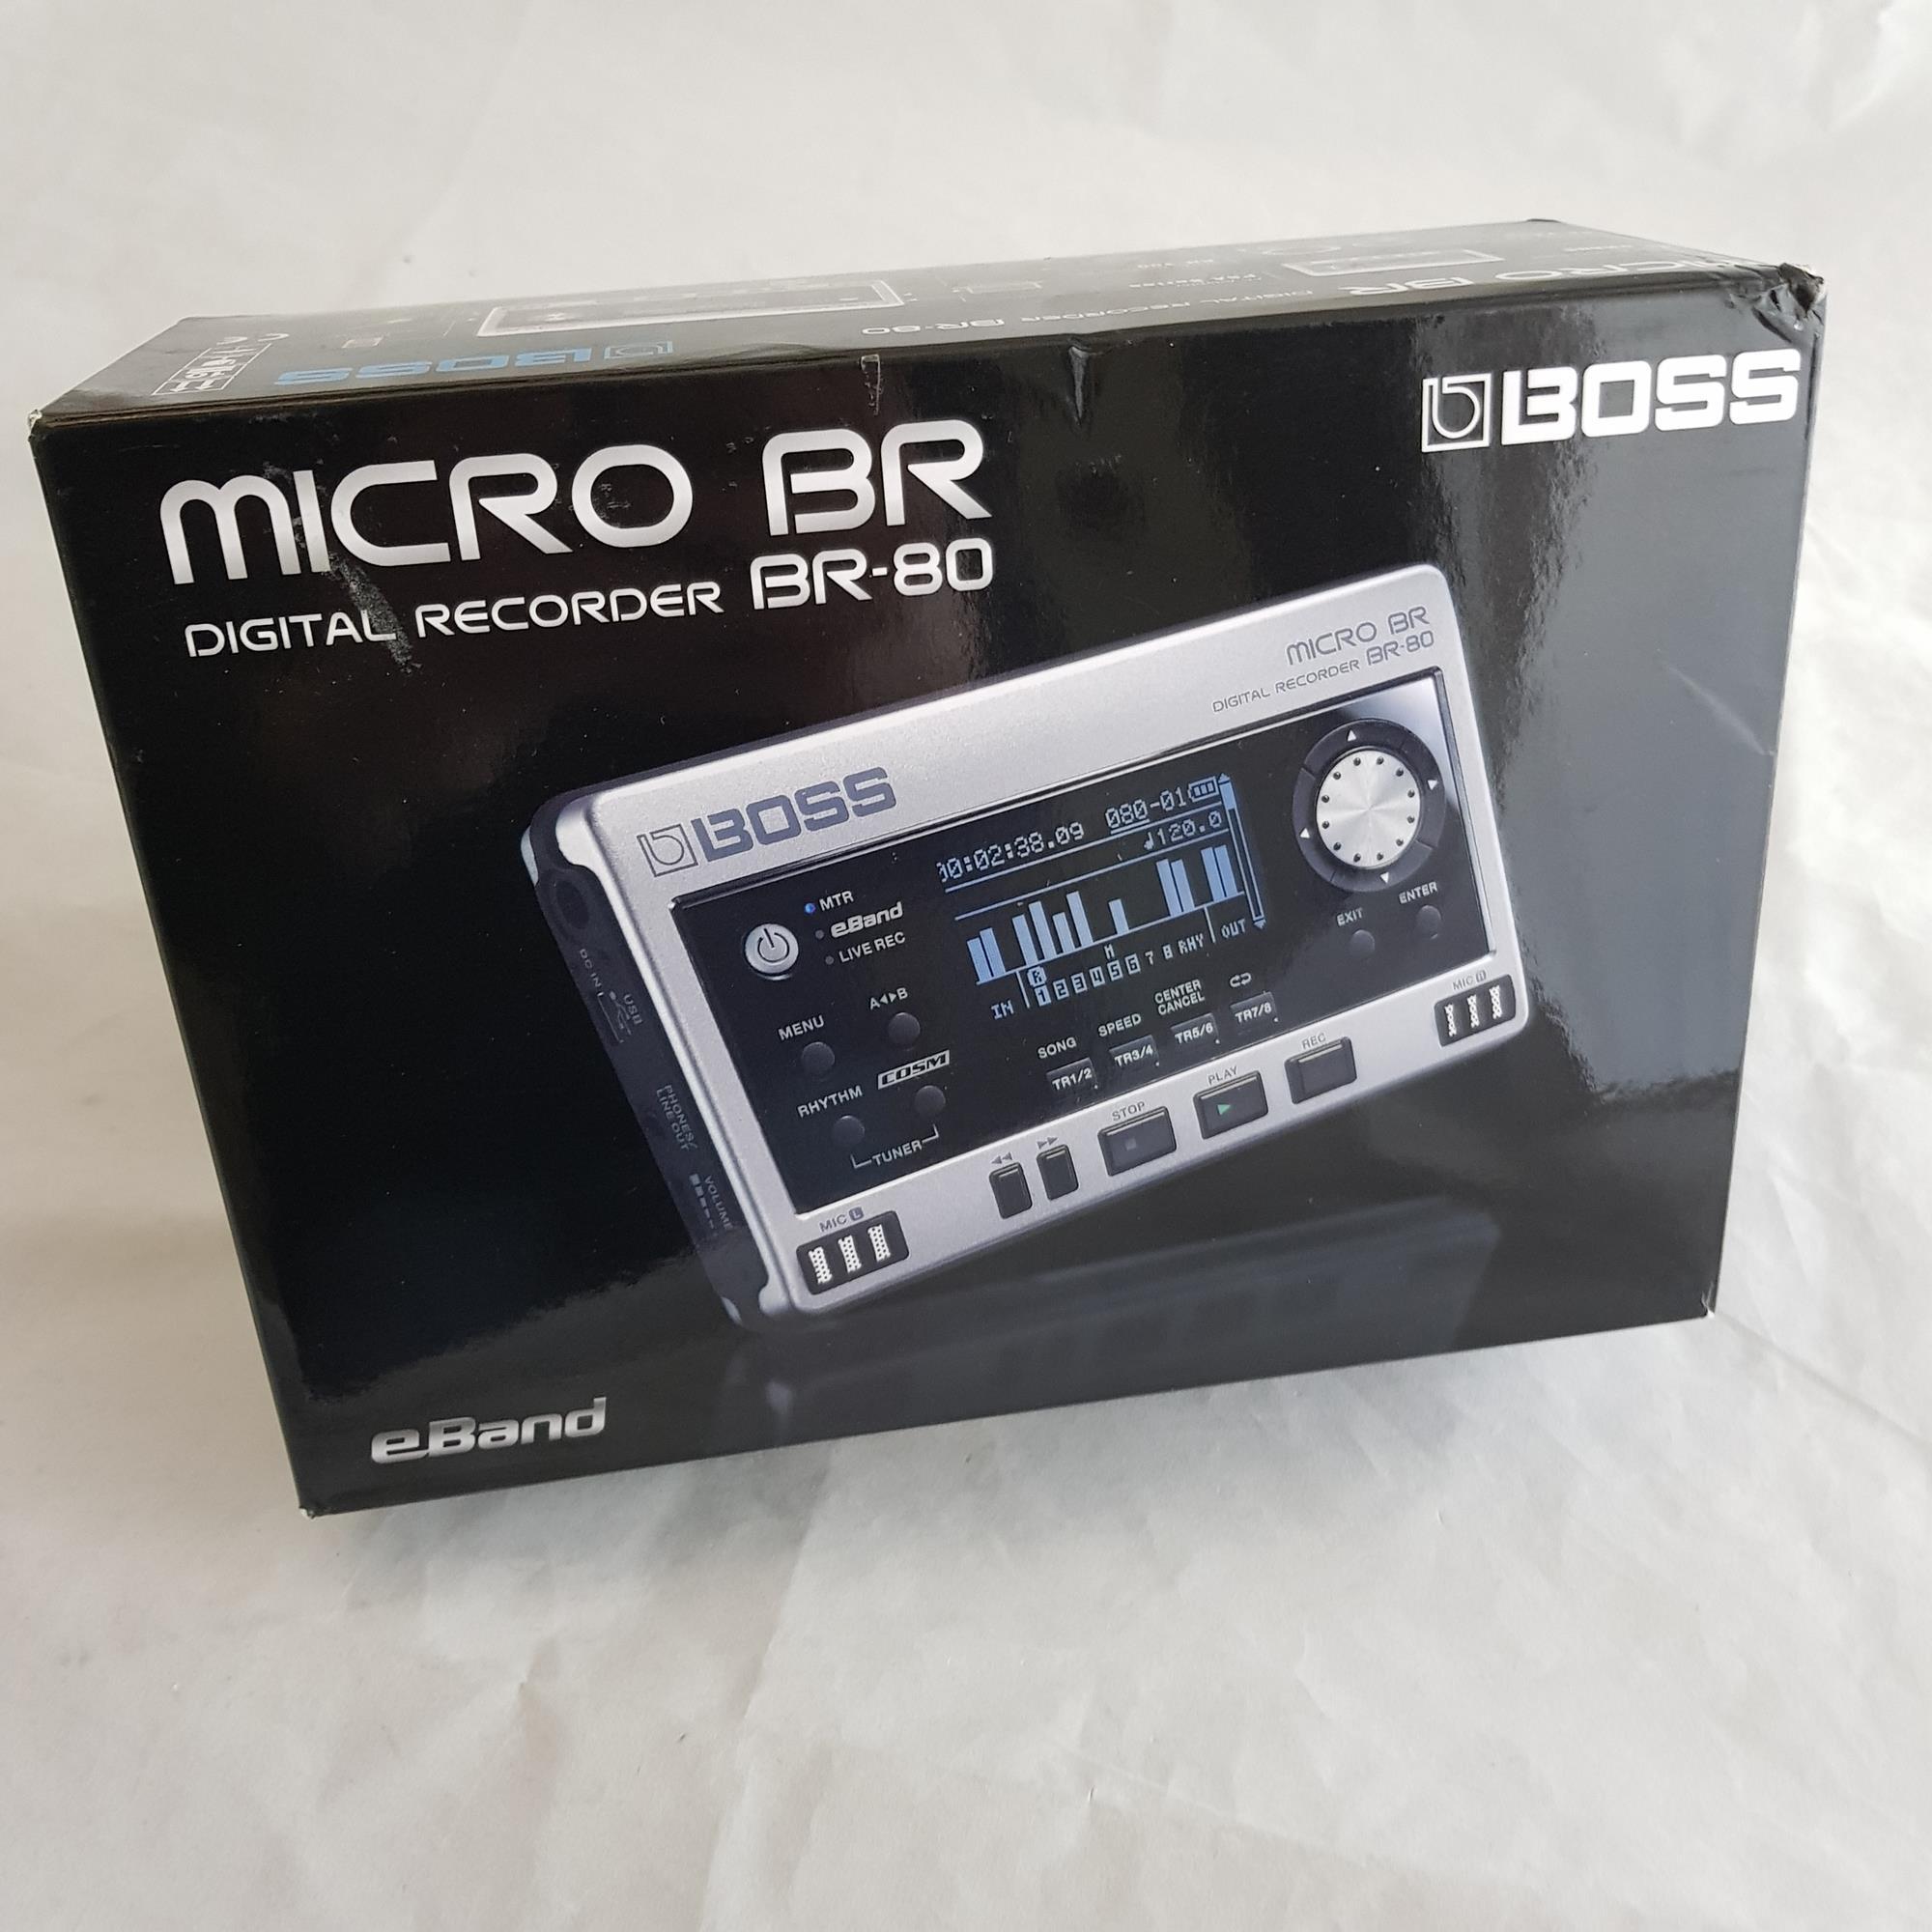 BOSS-BR80-MINI-RECORDER-sku-1619853490027